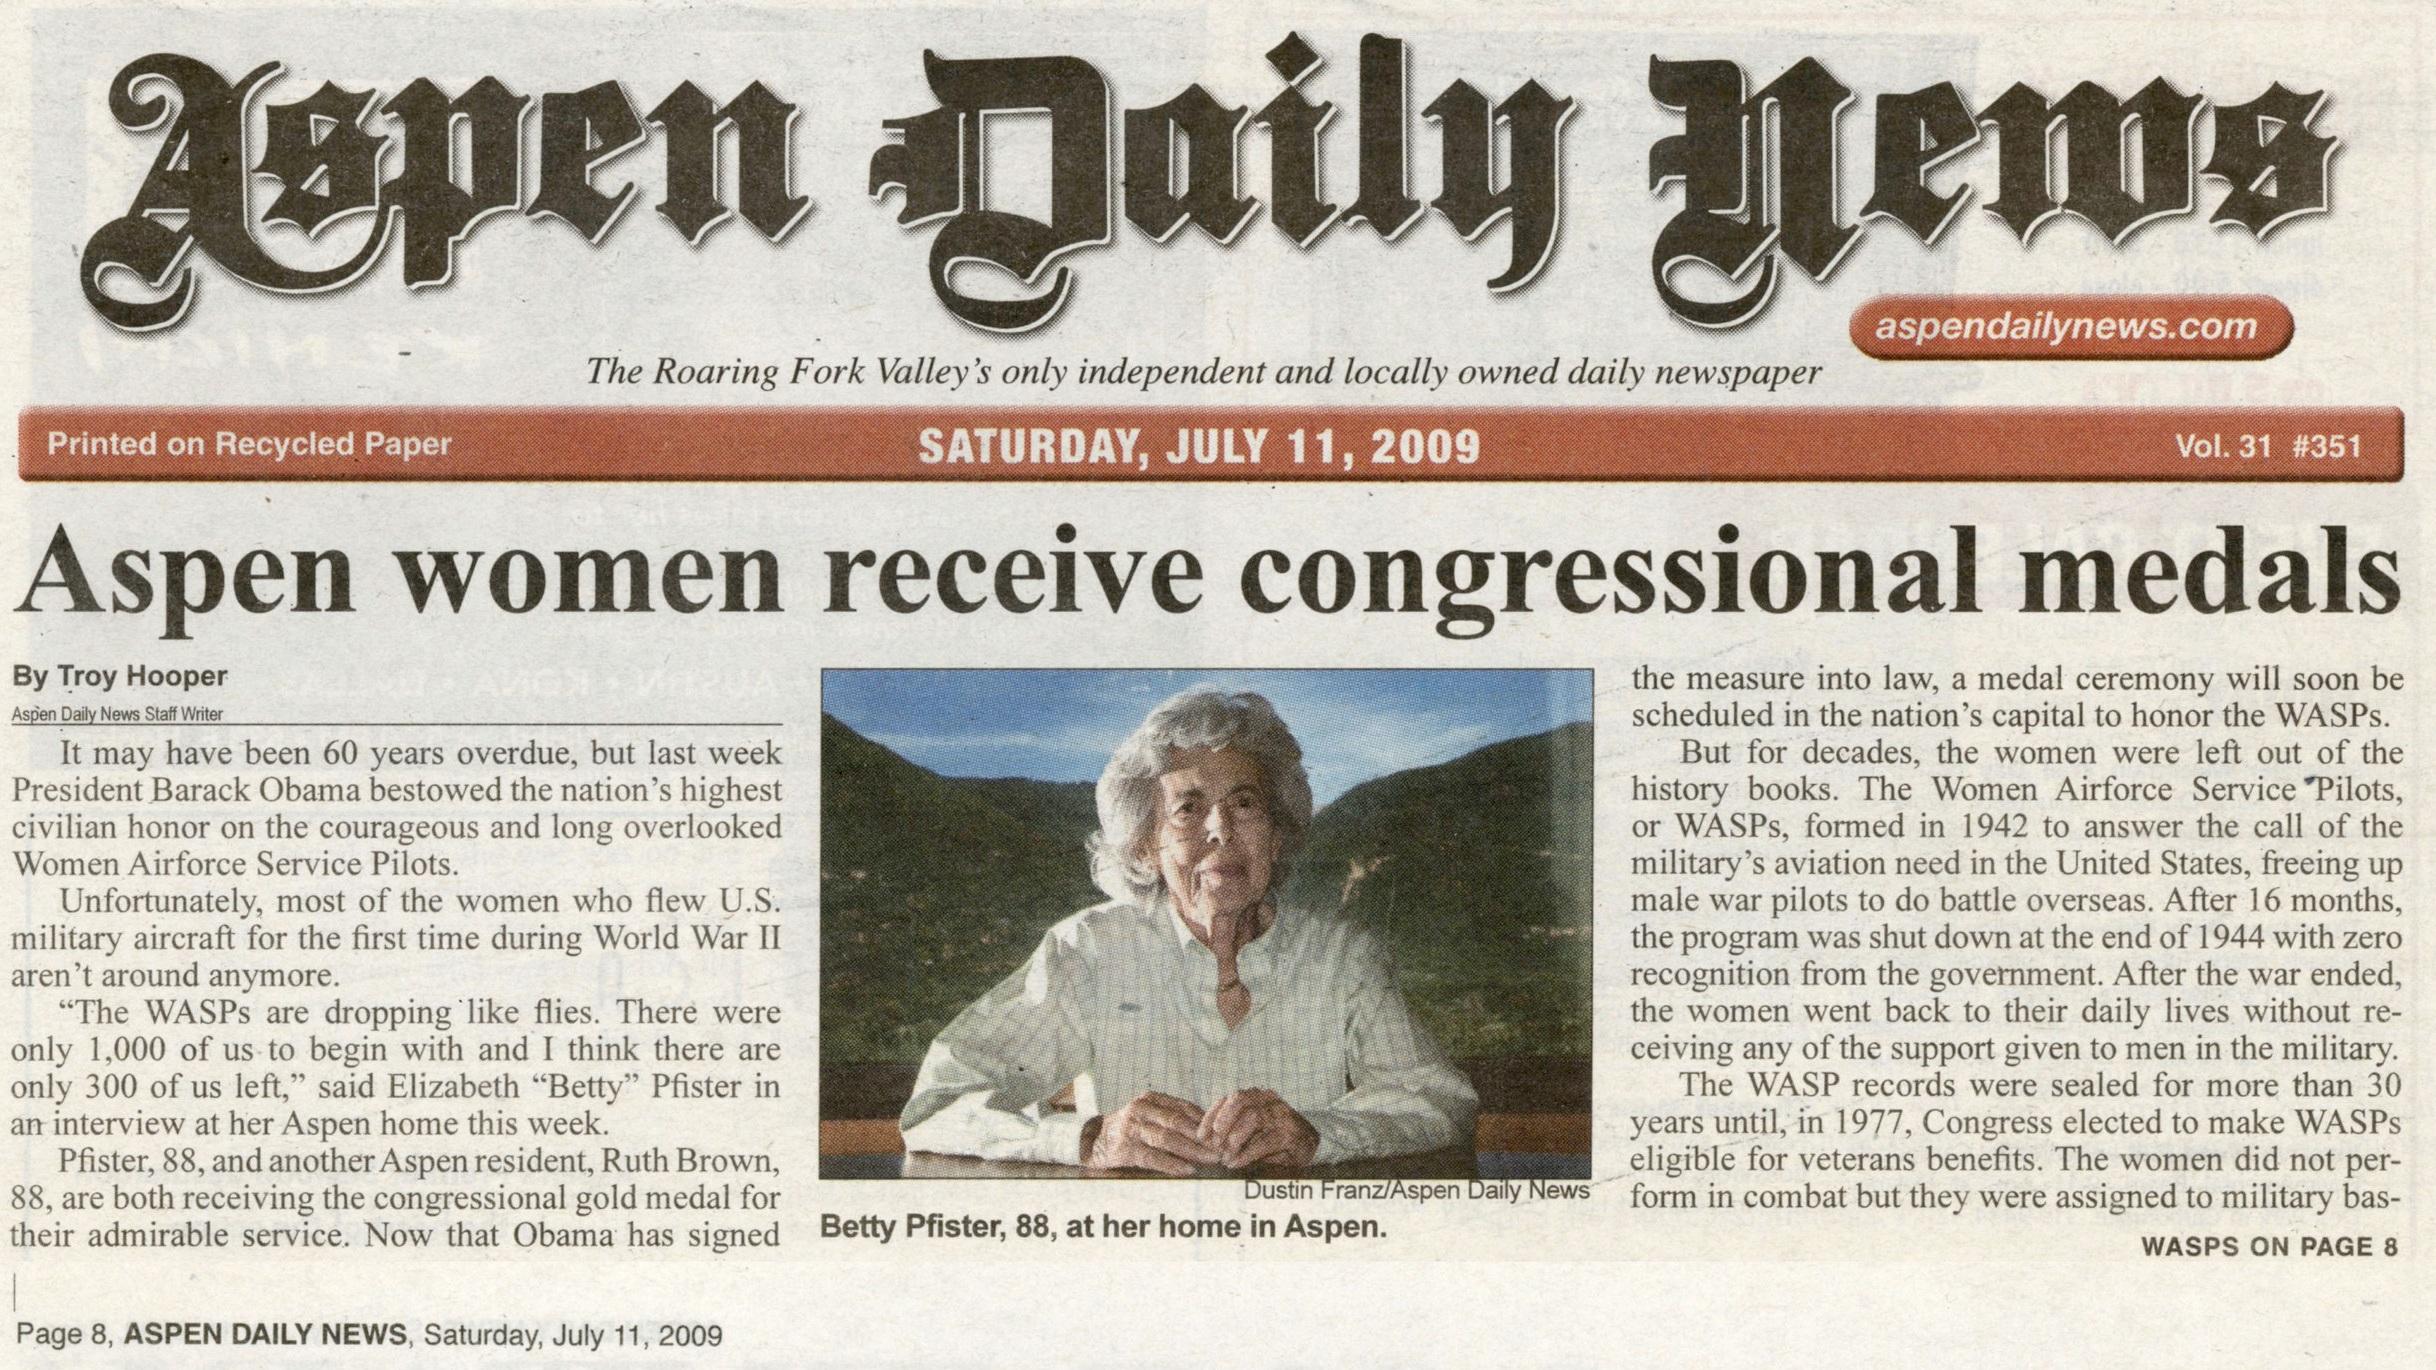 Aspen women receives congressional medals